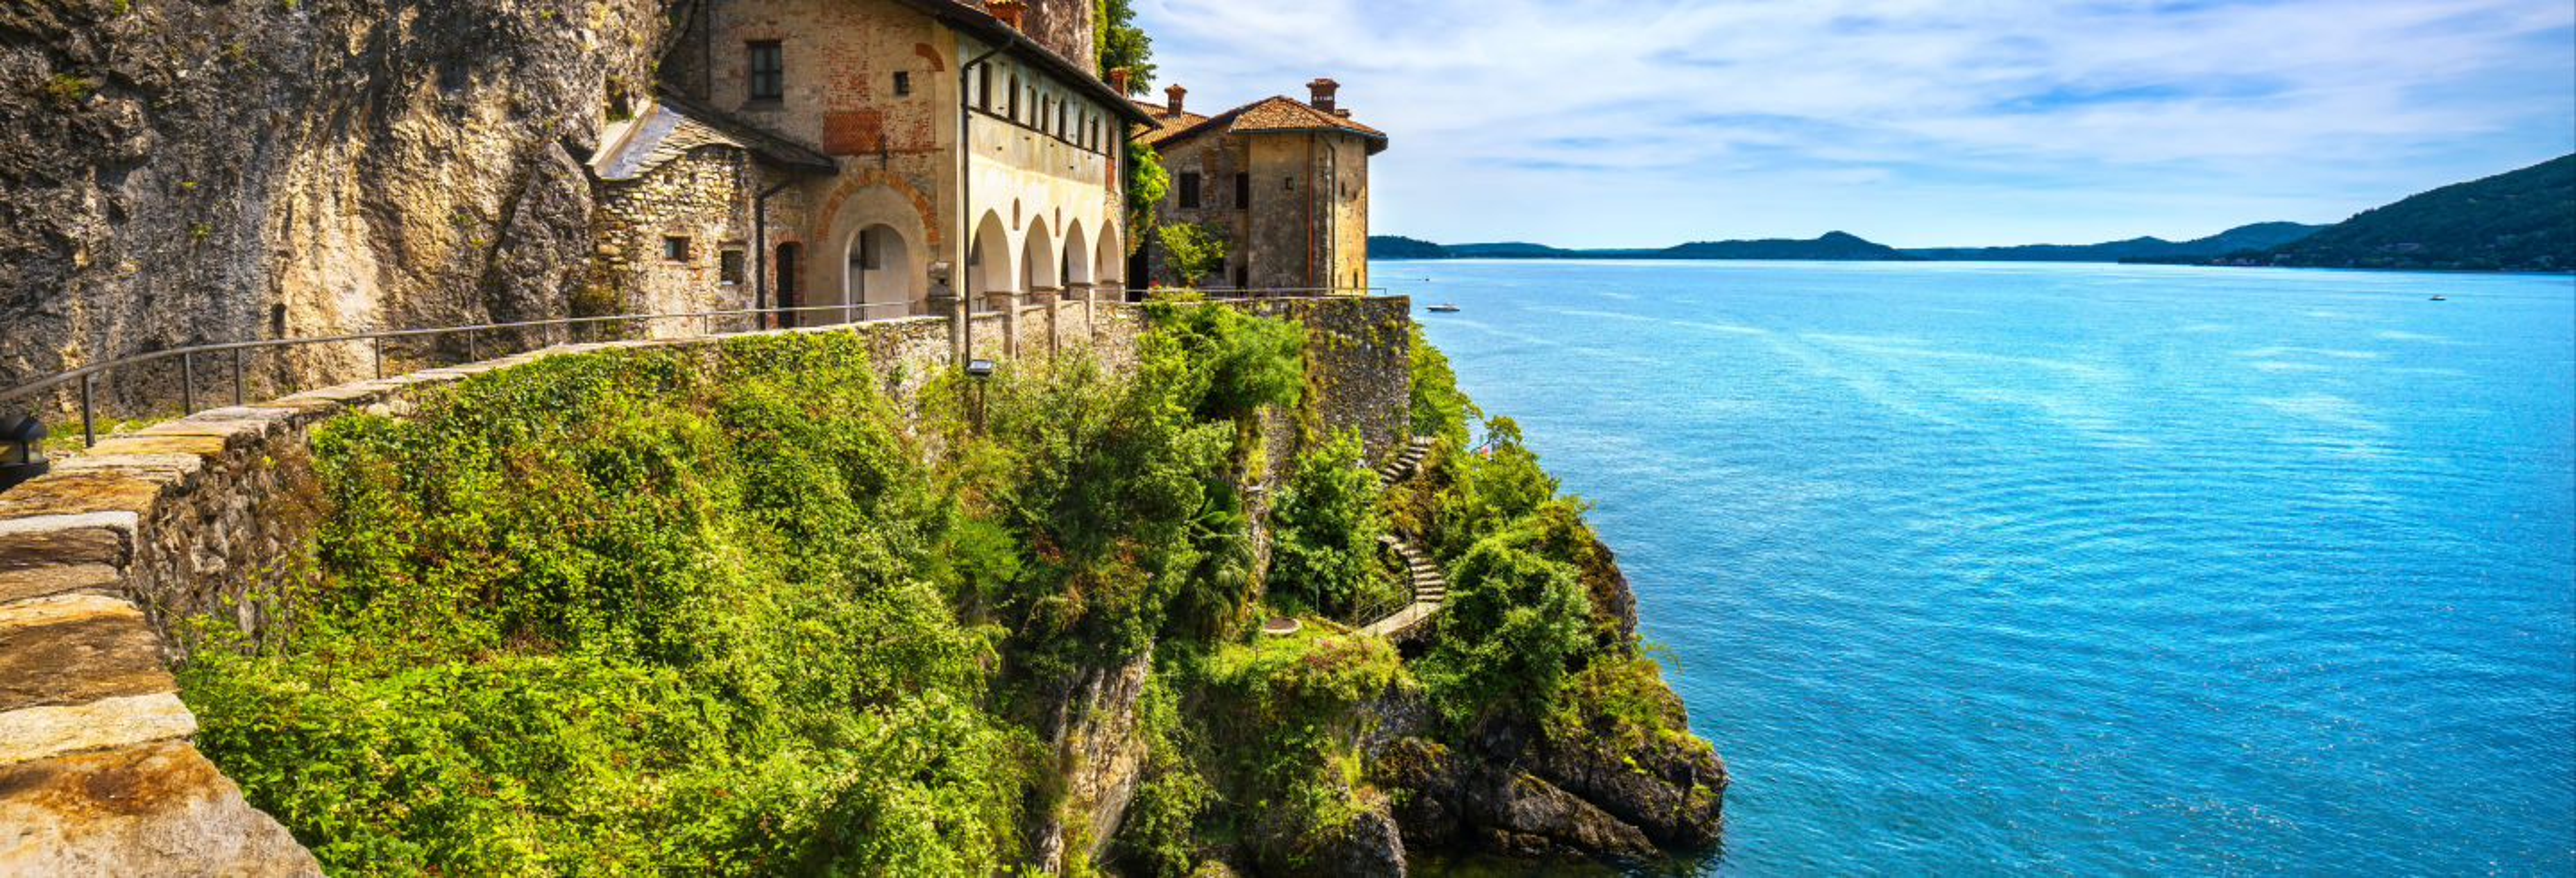 Passeio de barco pelas vilas do Lago Maggiore